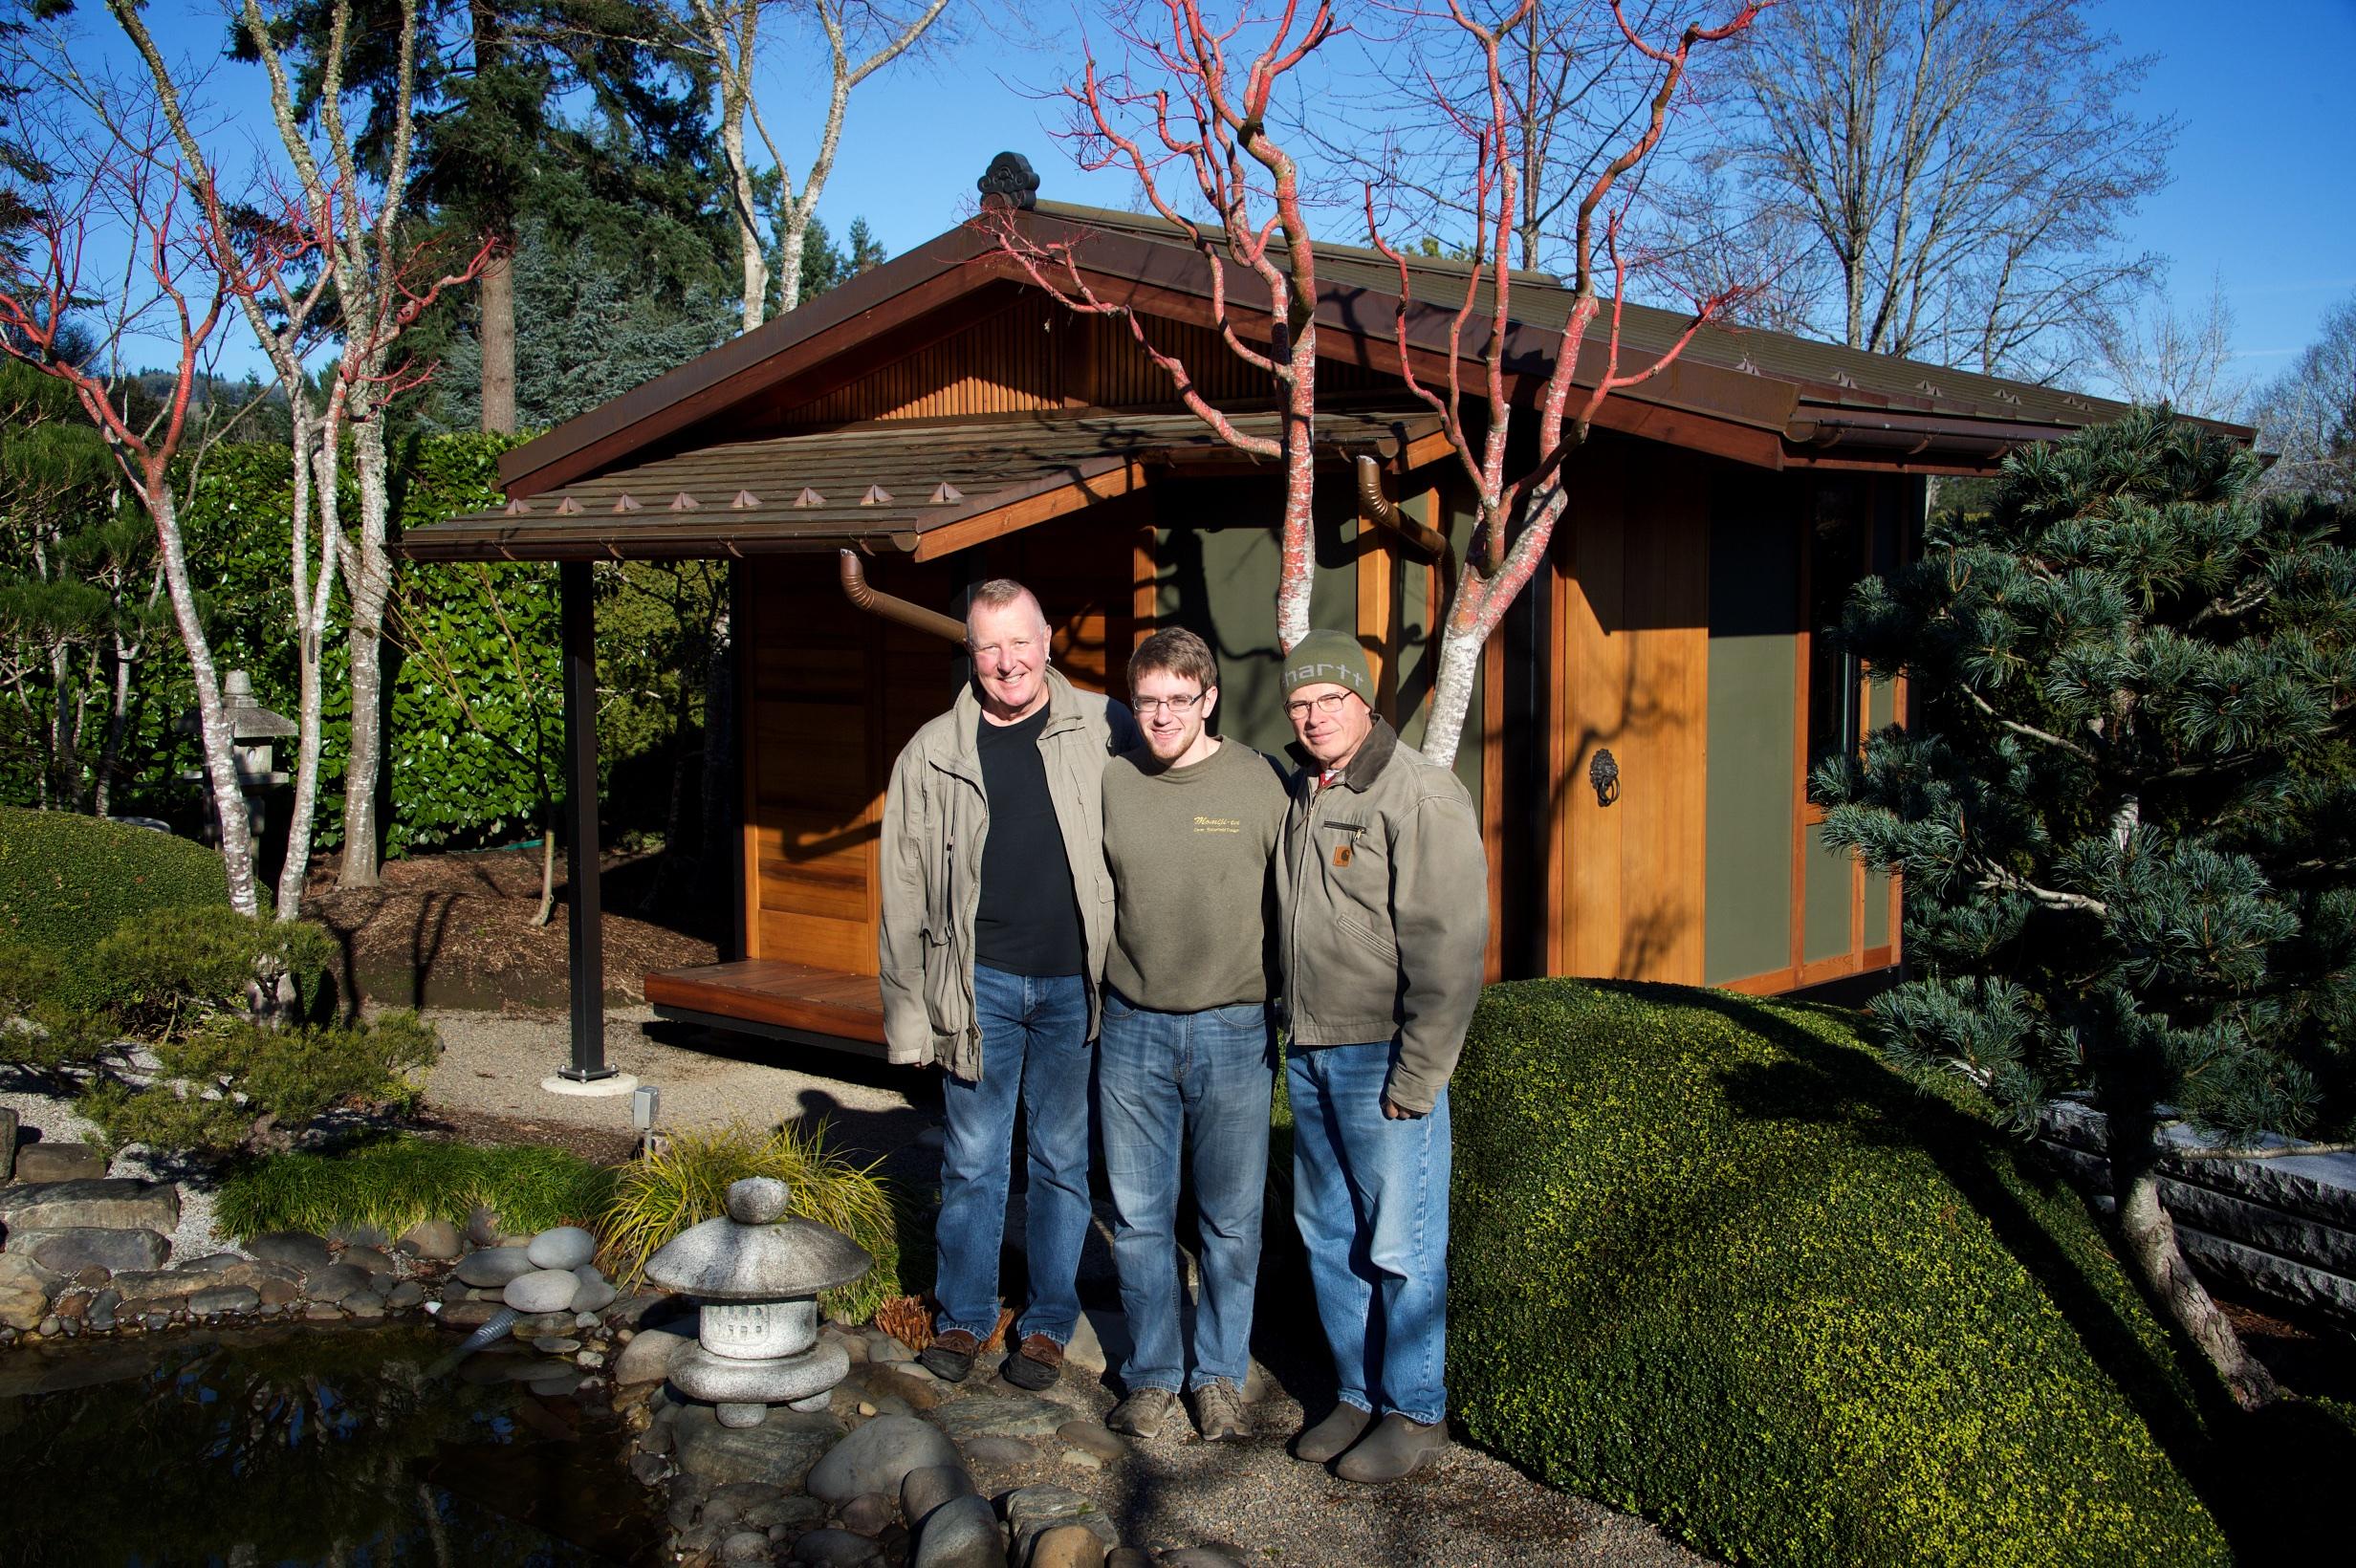 Bill Cook, Matthew Boggess, and Gwil Evans, December 2015.